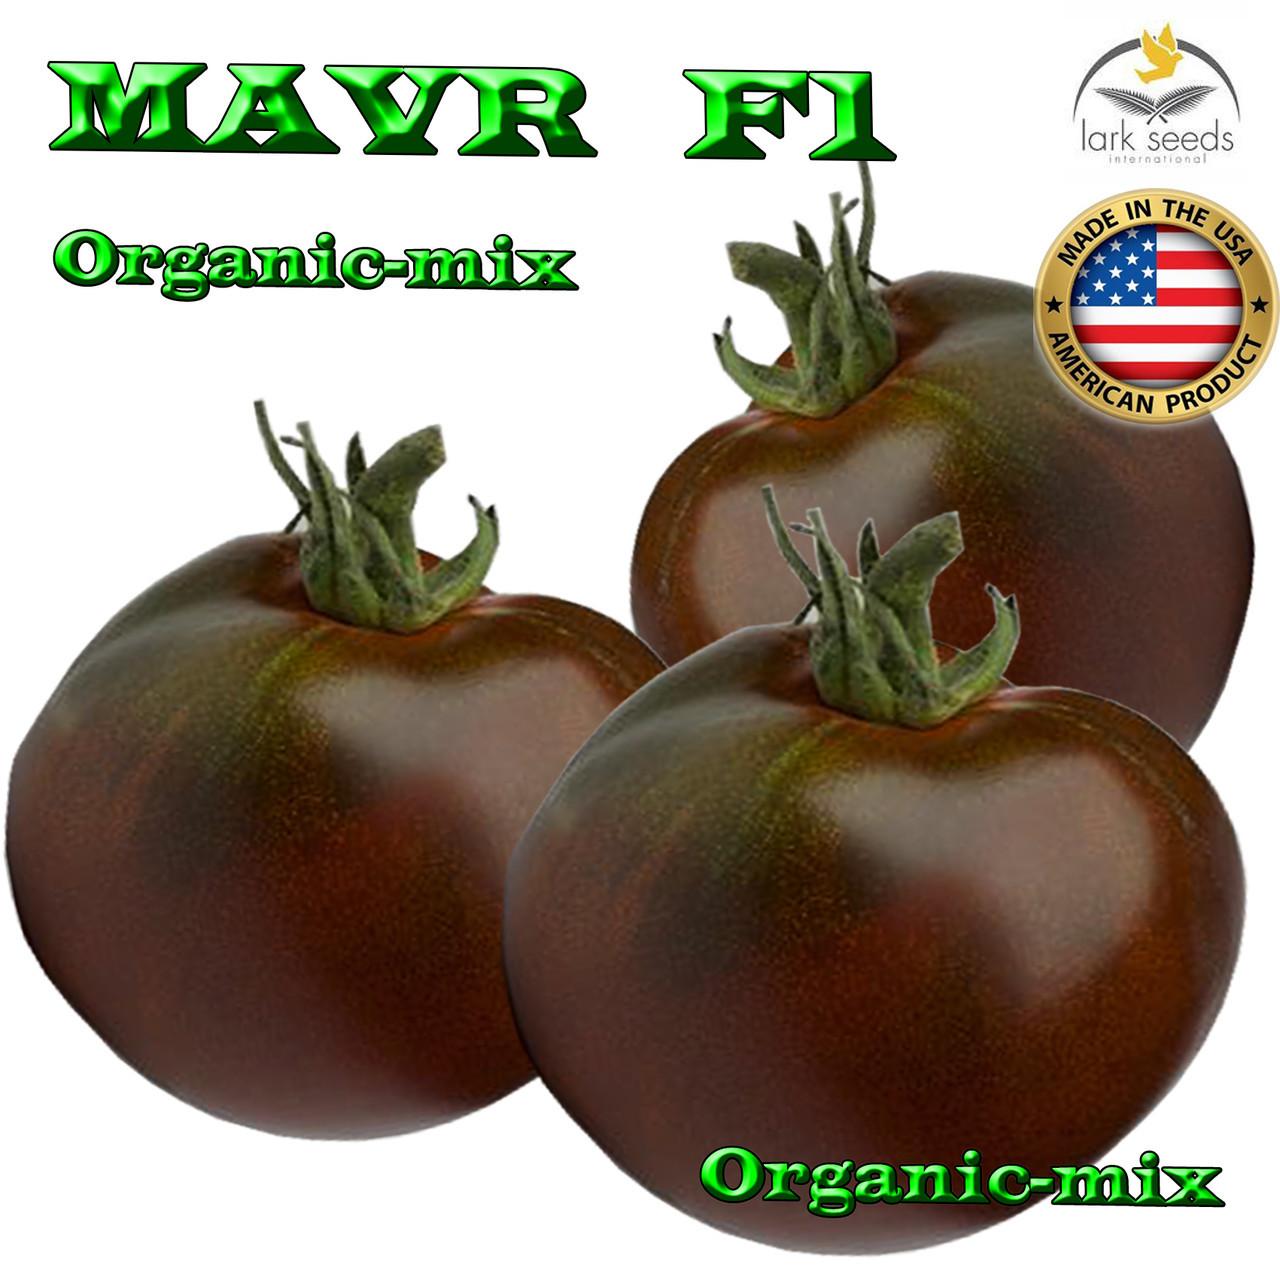 Семена, томат коричневый МАВР F1 / MAVR F1, ТМ Lark Seeds, 1000 семян